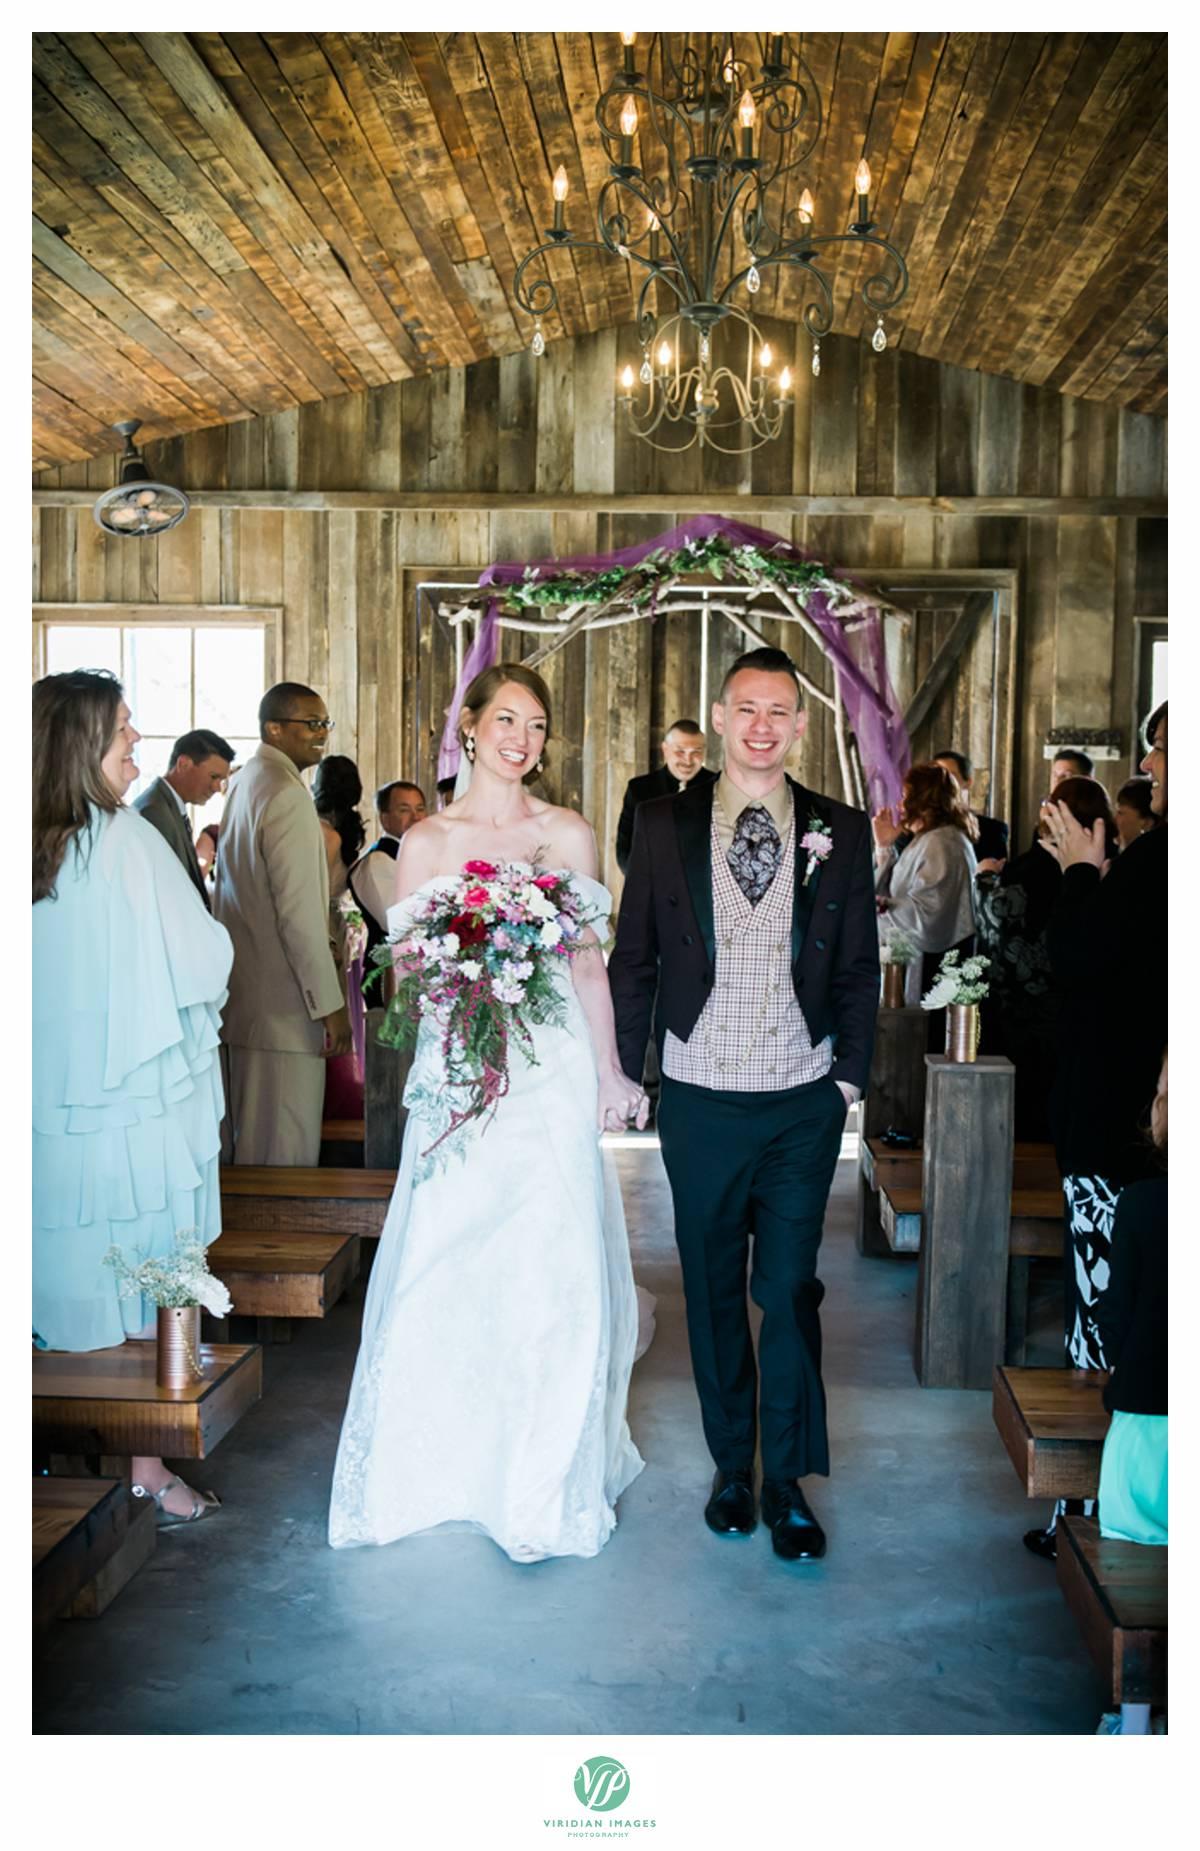 Retreat-at-Hiawassee-river-wedding-Viridian-Images-Photography 22